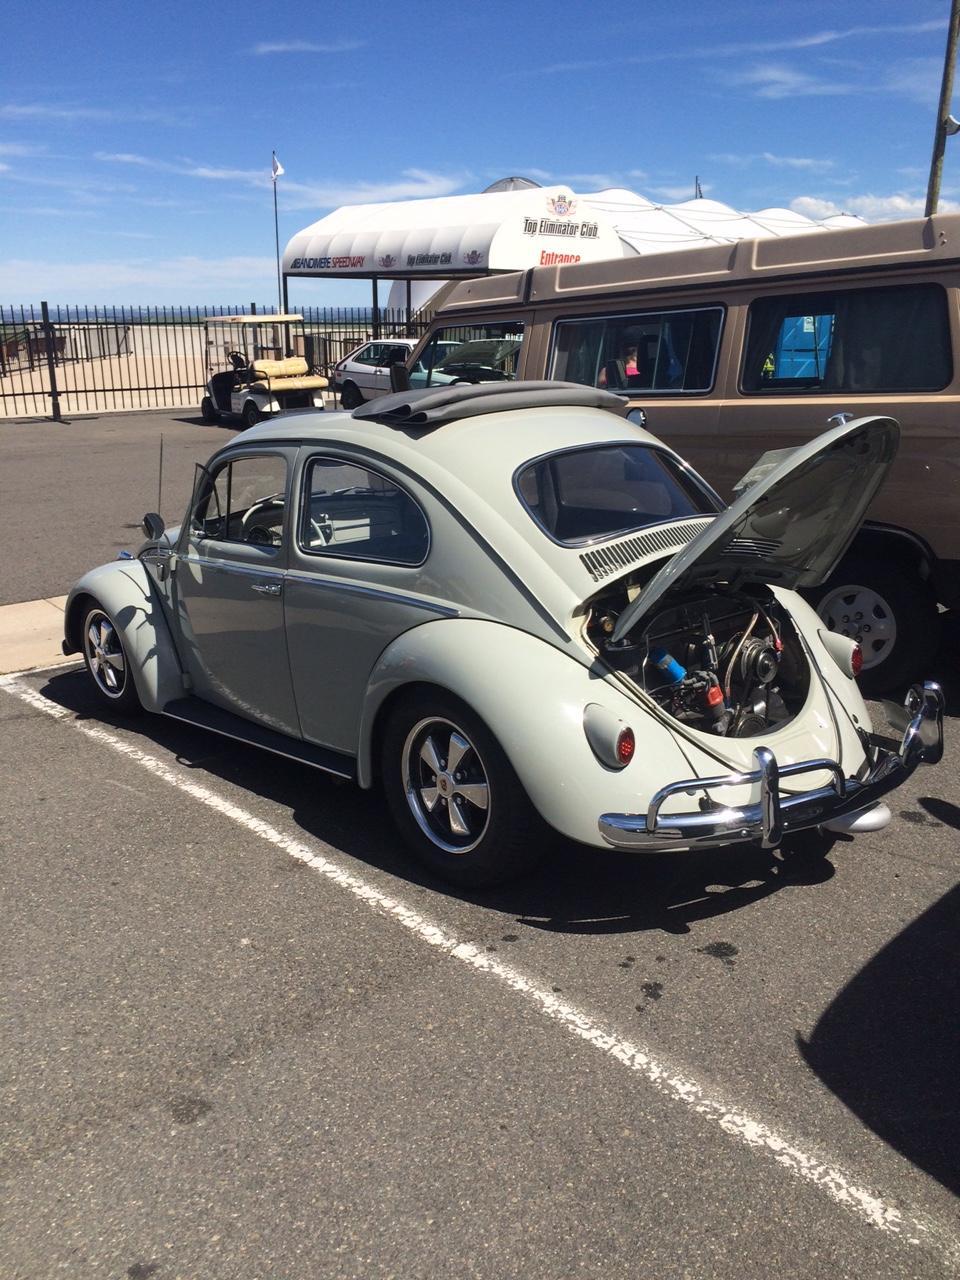 Denver bug in 2015